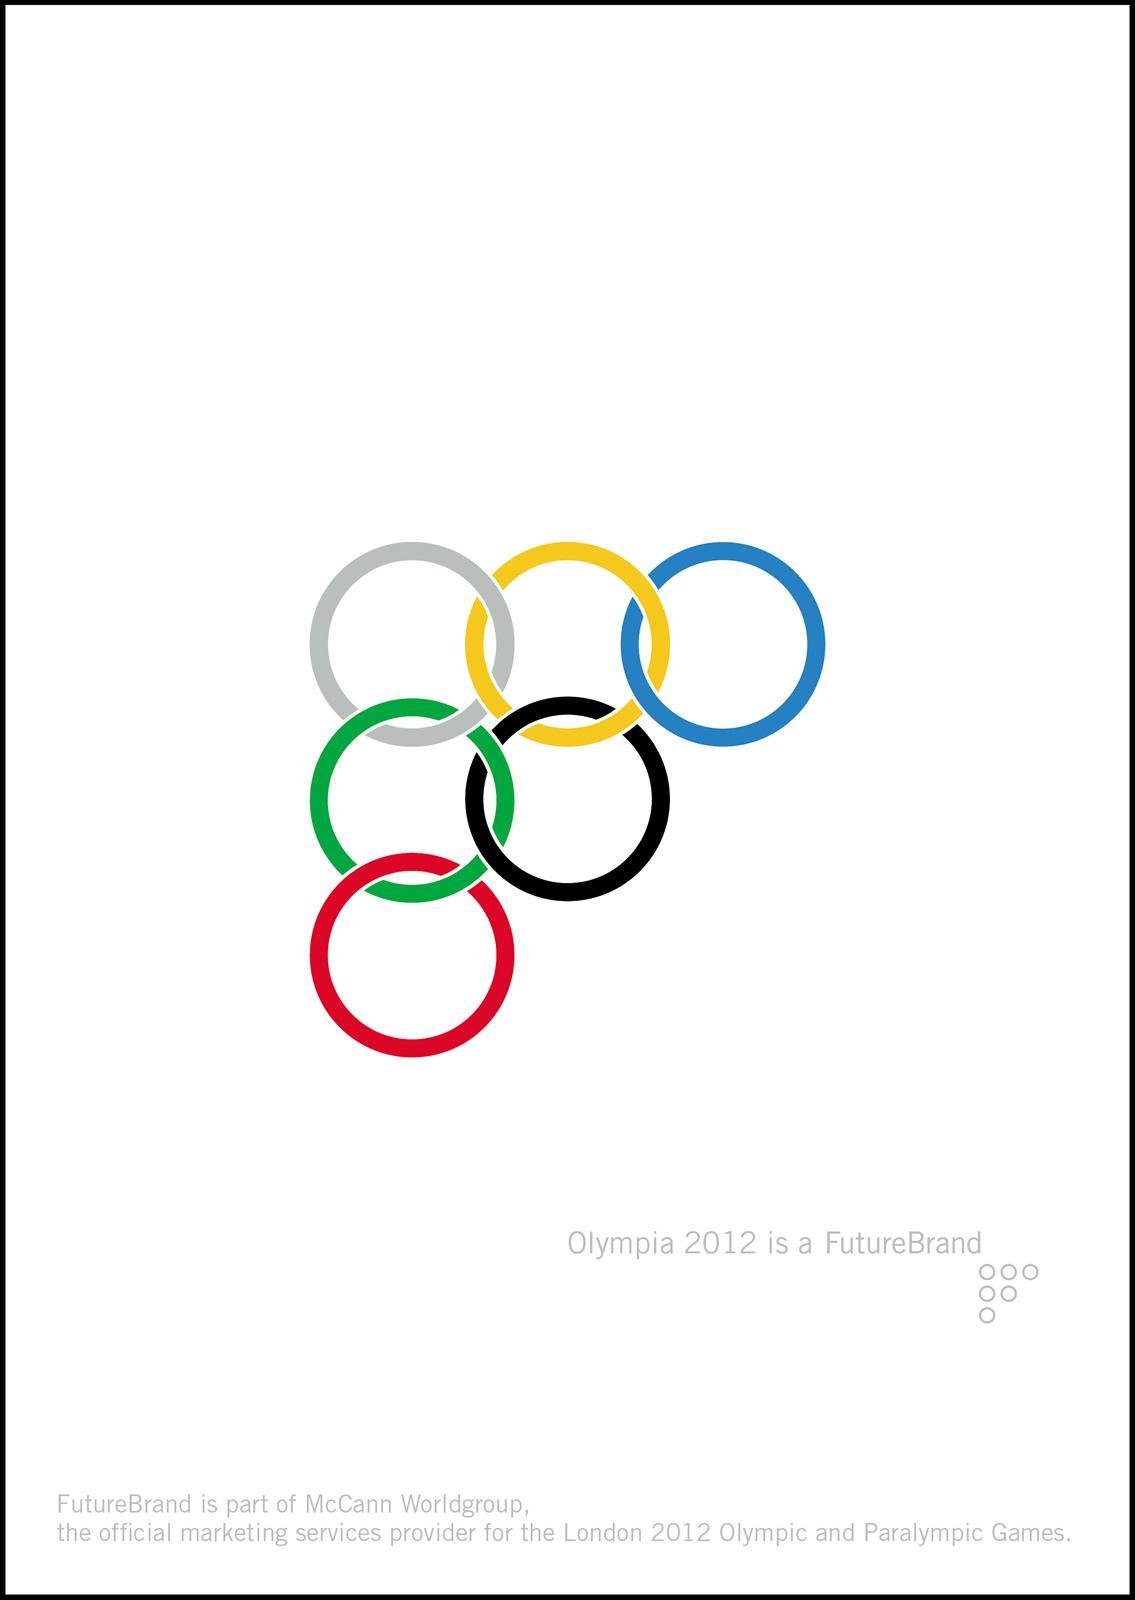 Olympics Print Ad -  Olympia 2012 is a FutureBrand